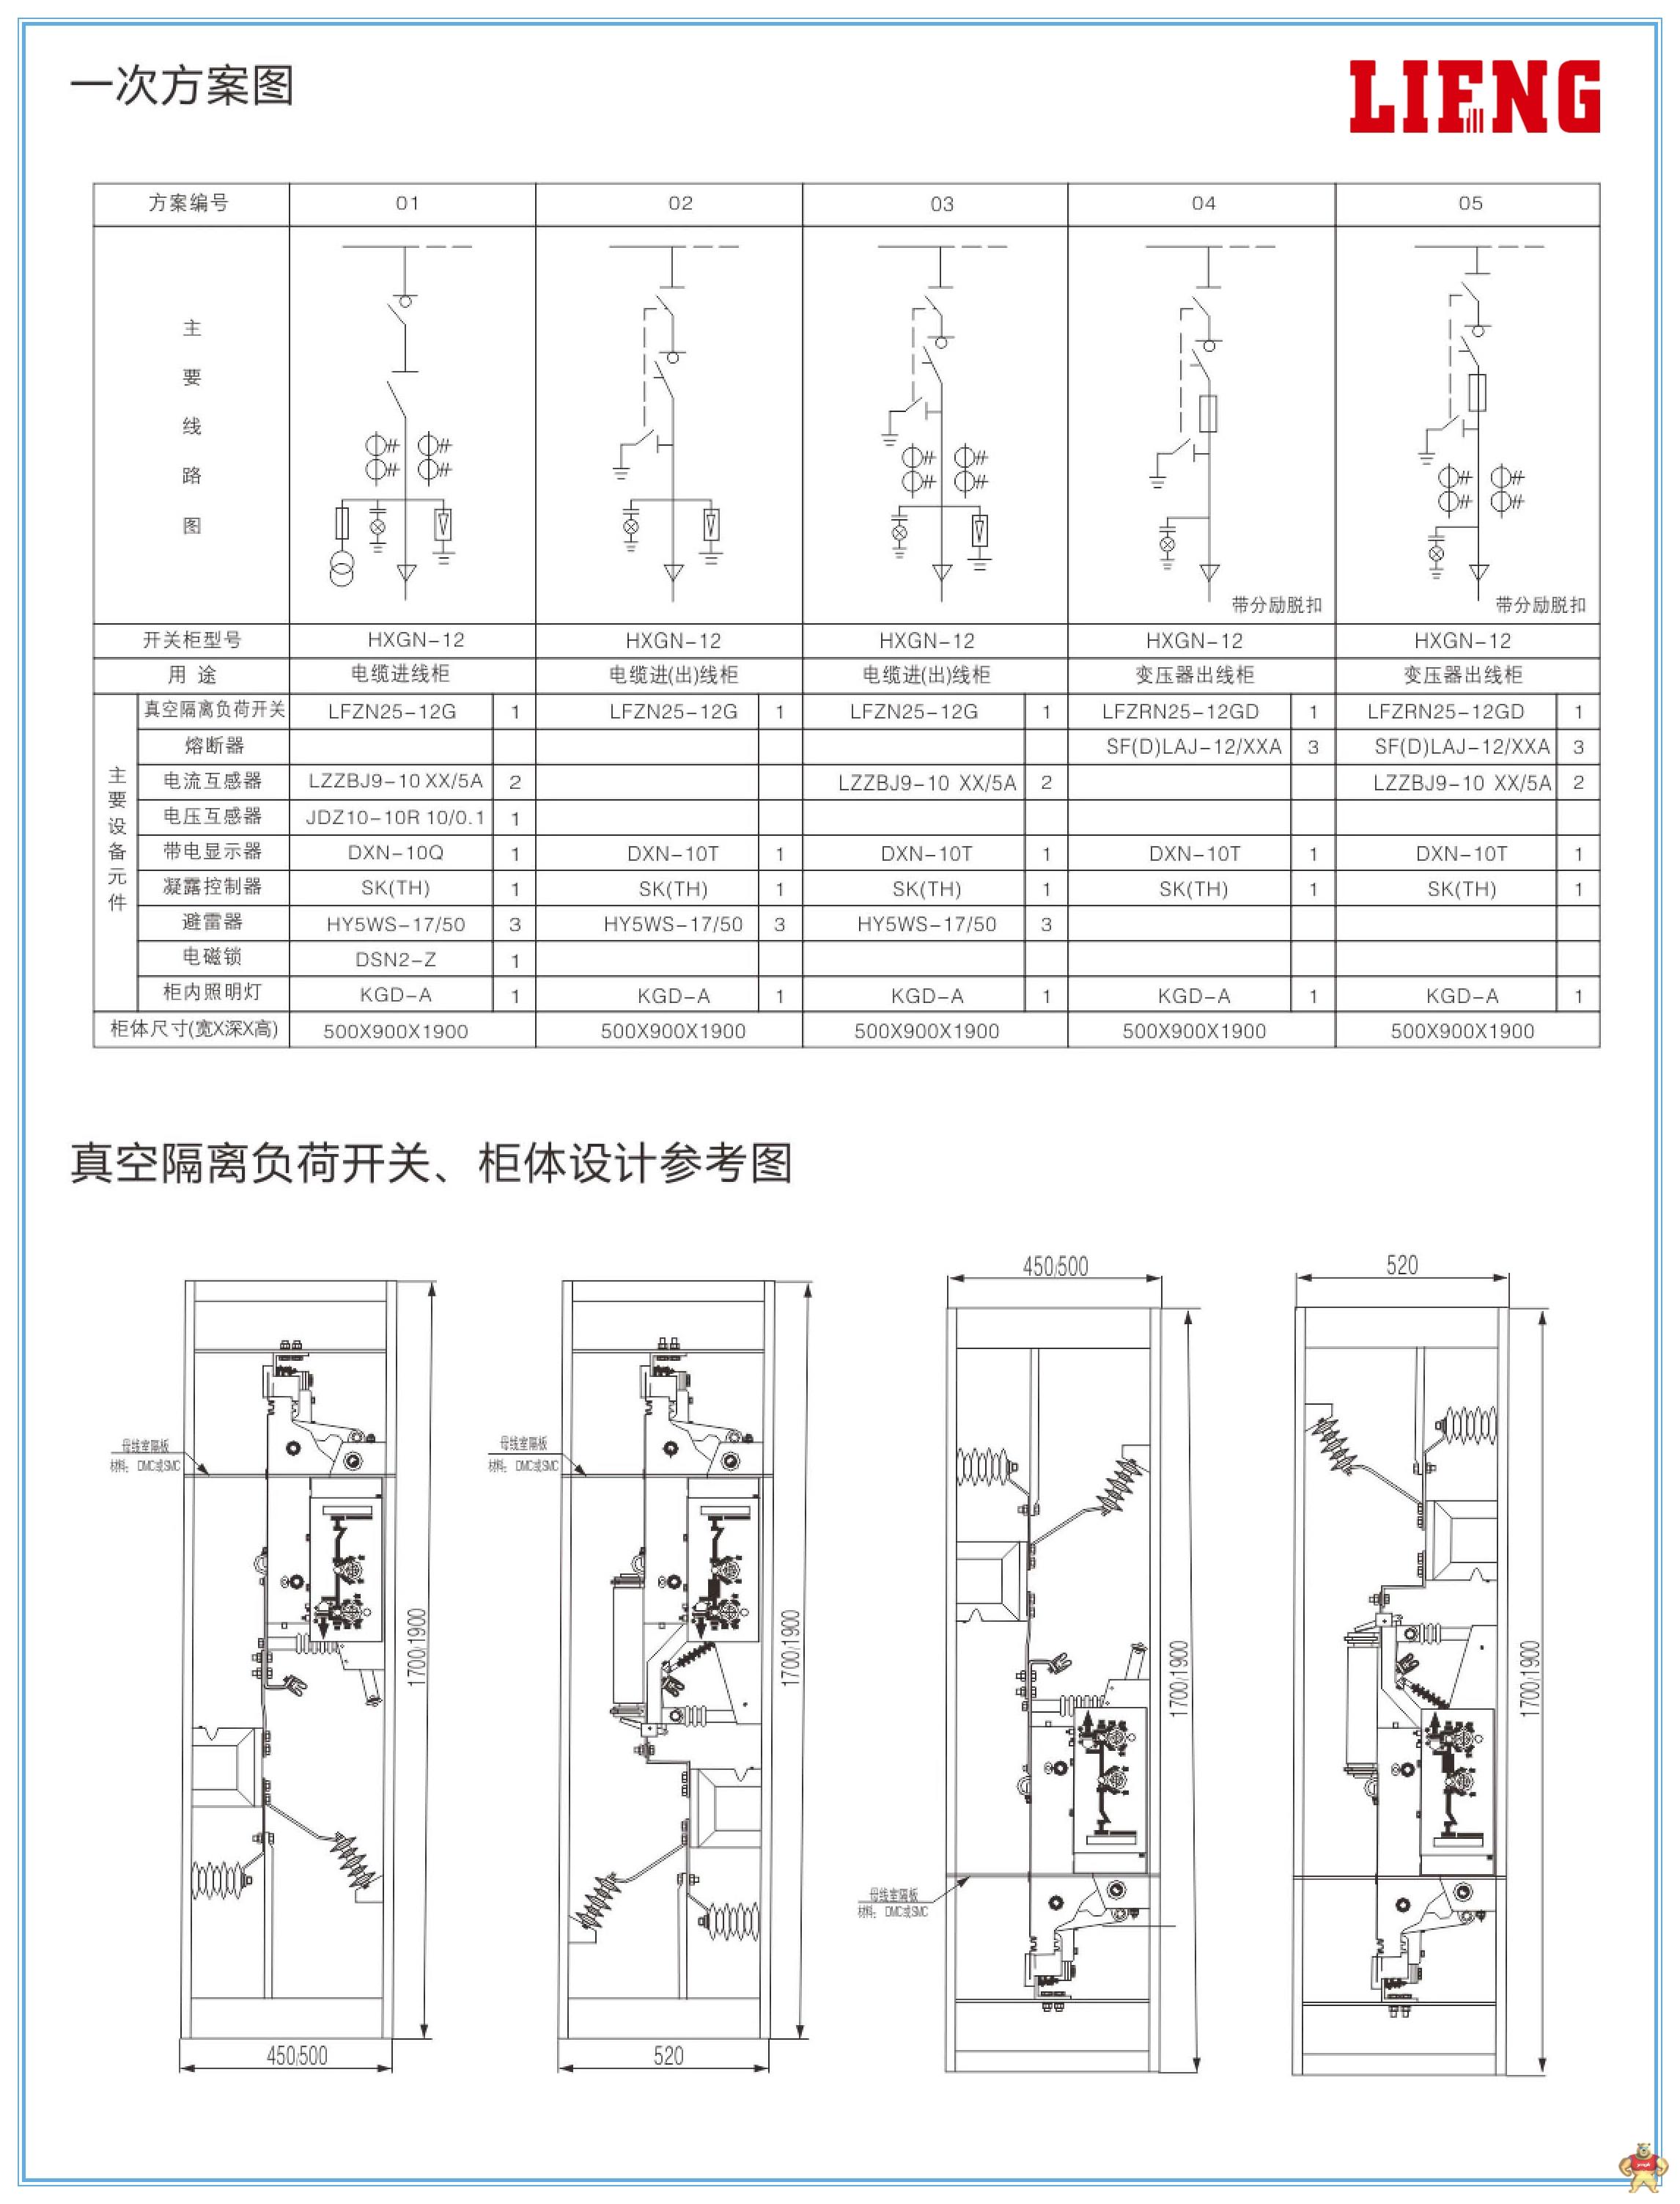 立枫 FZRN61-12D/T630-25 FZRN61-12,FZRN61-12D,FZRN61-12D/T630,FZRN61